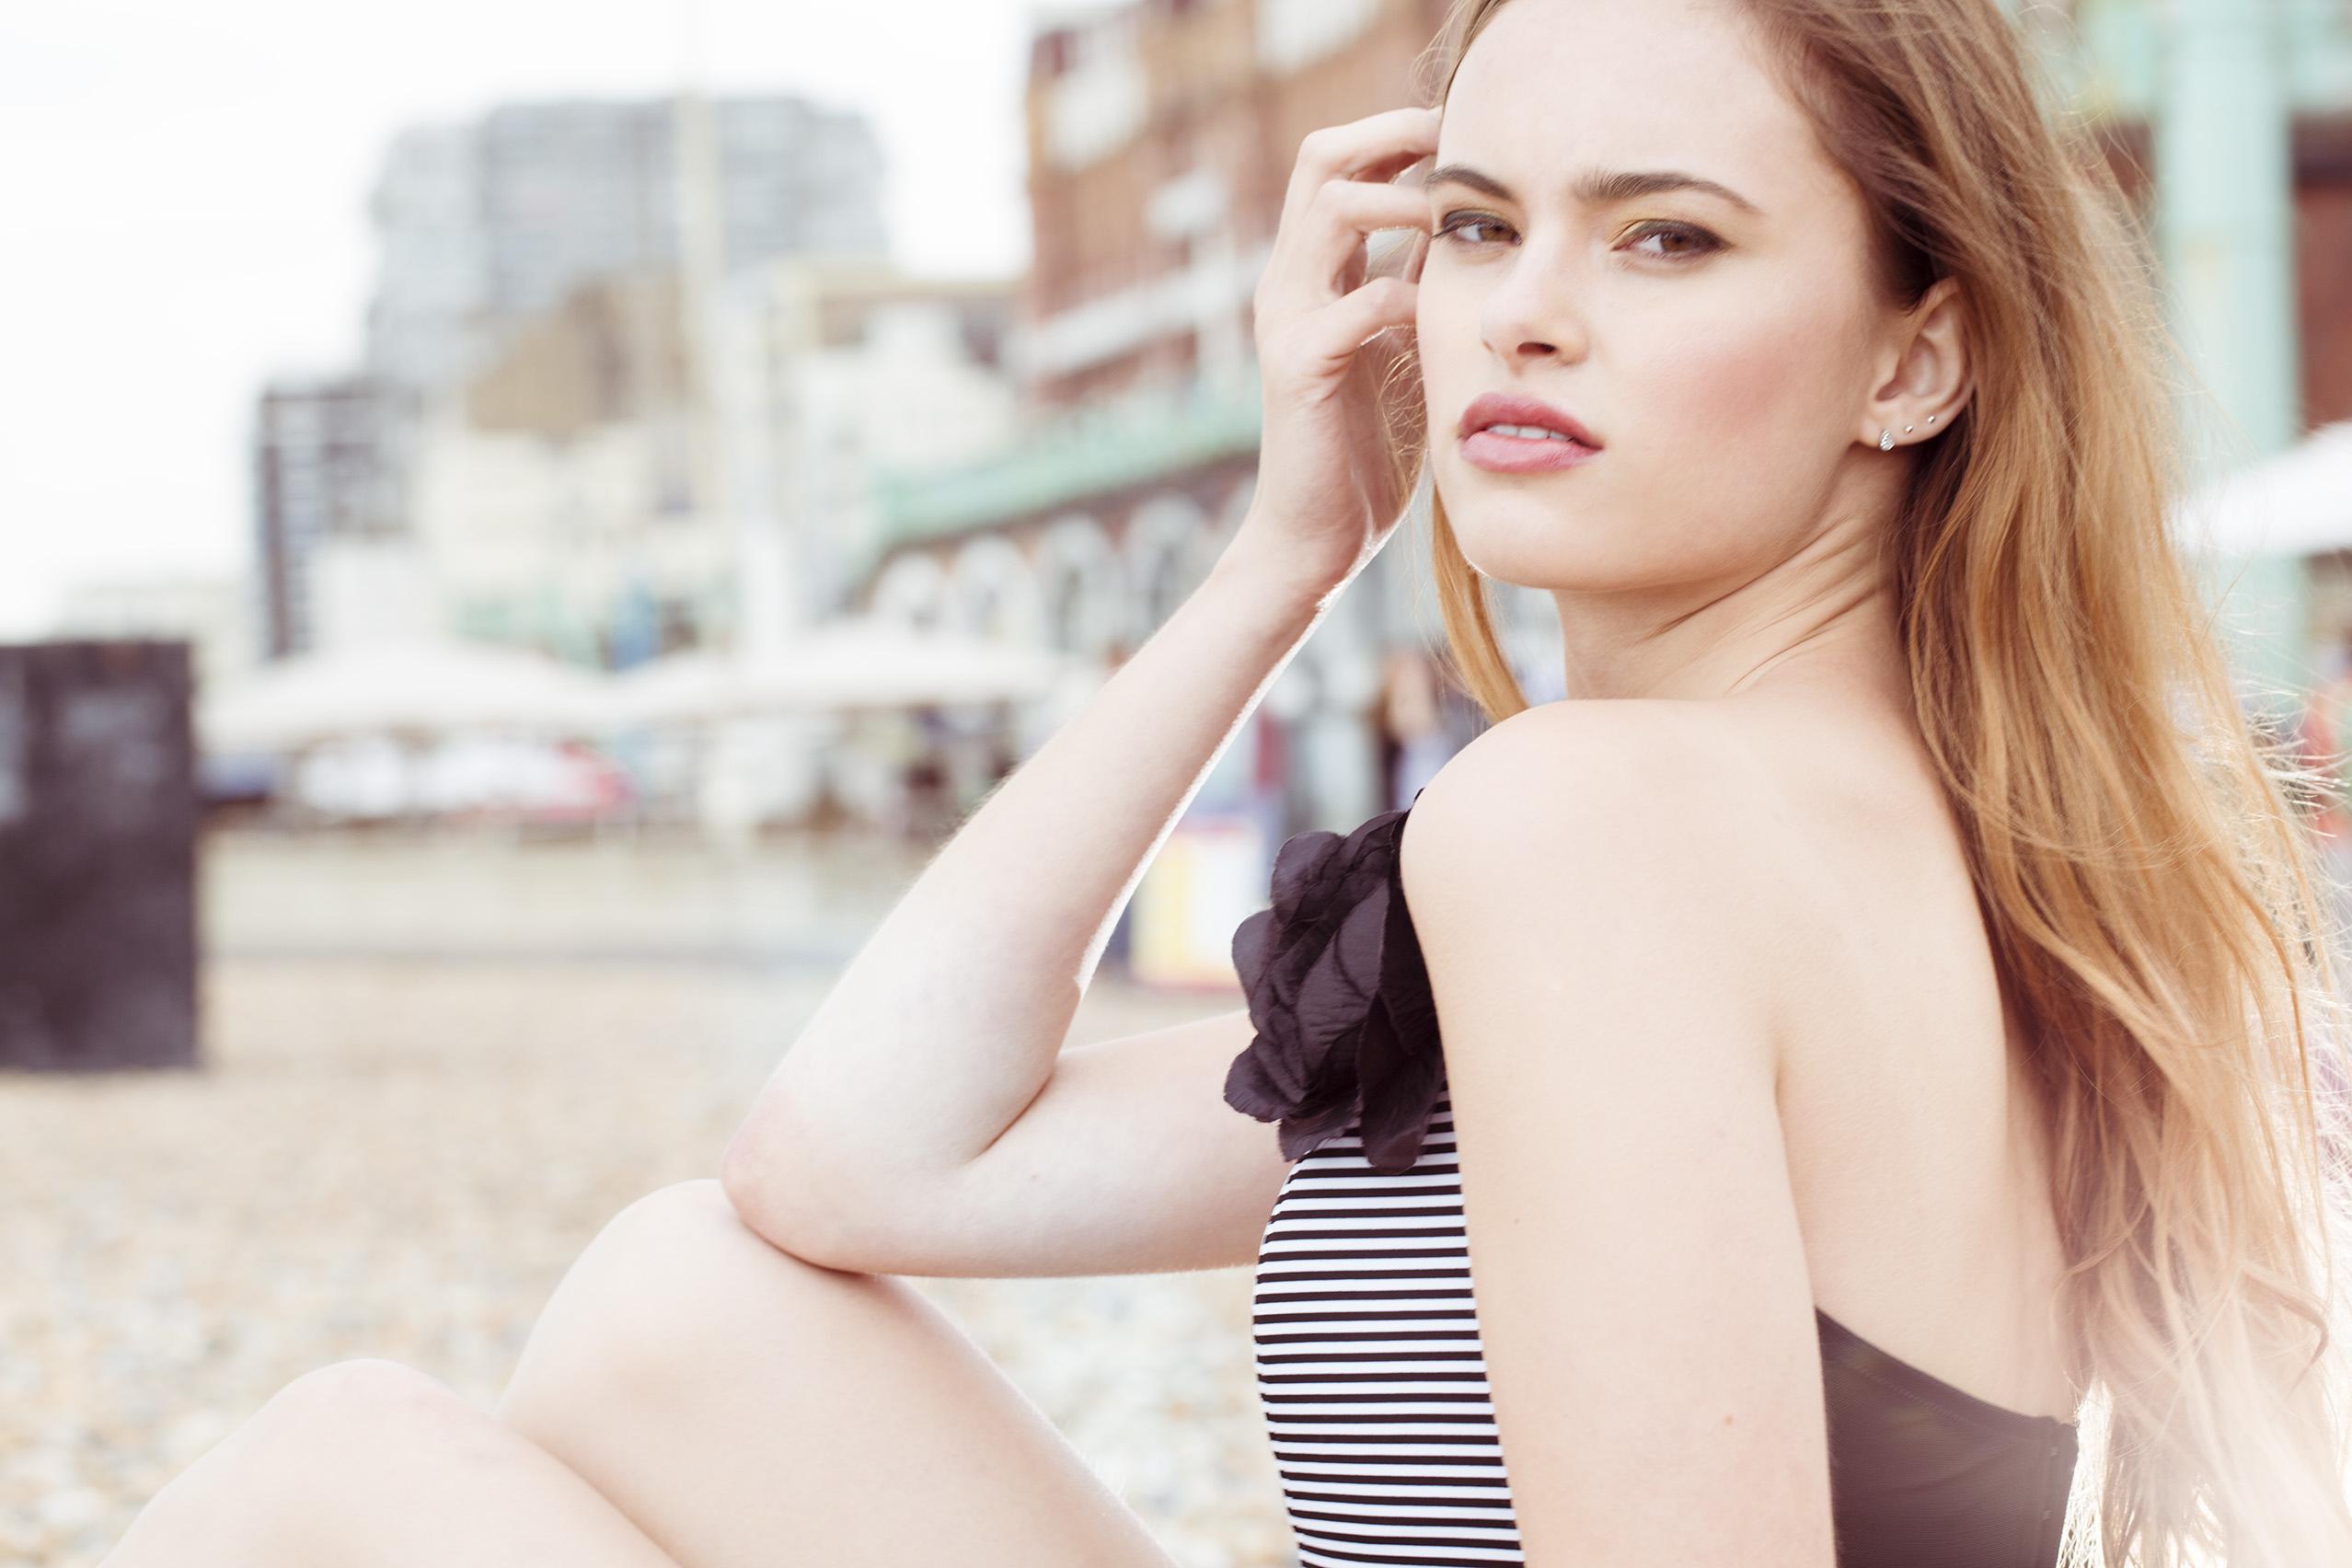 Fashion-Photographer-Margaret-Yescombe-location-photo-shoot-holiday-beach-designer-swimwear-258-2556px